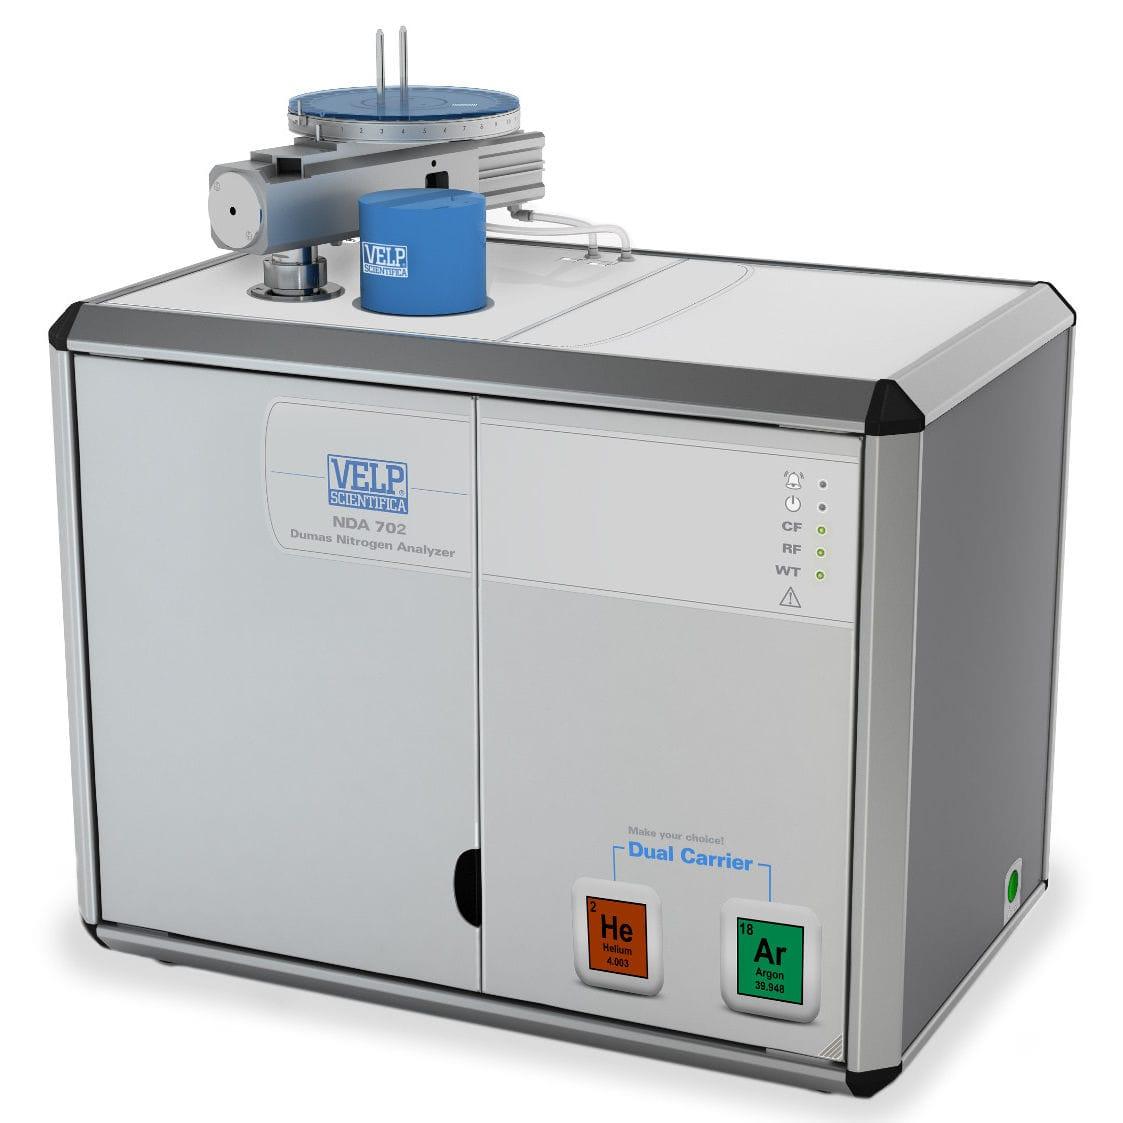 Automatic protein analyzer / benchtop / laboratory / Dumas method - NDA 702 - VELP Scientifica